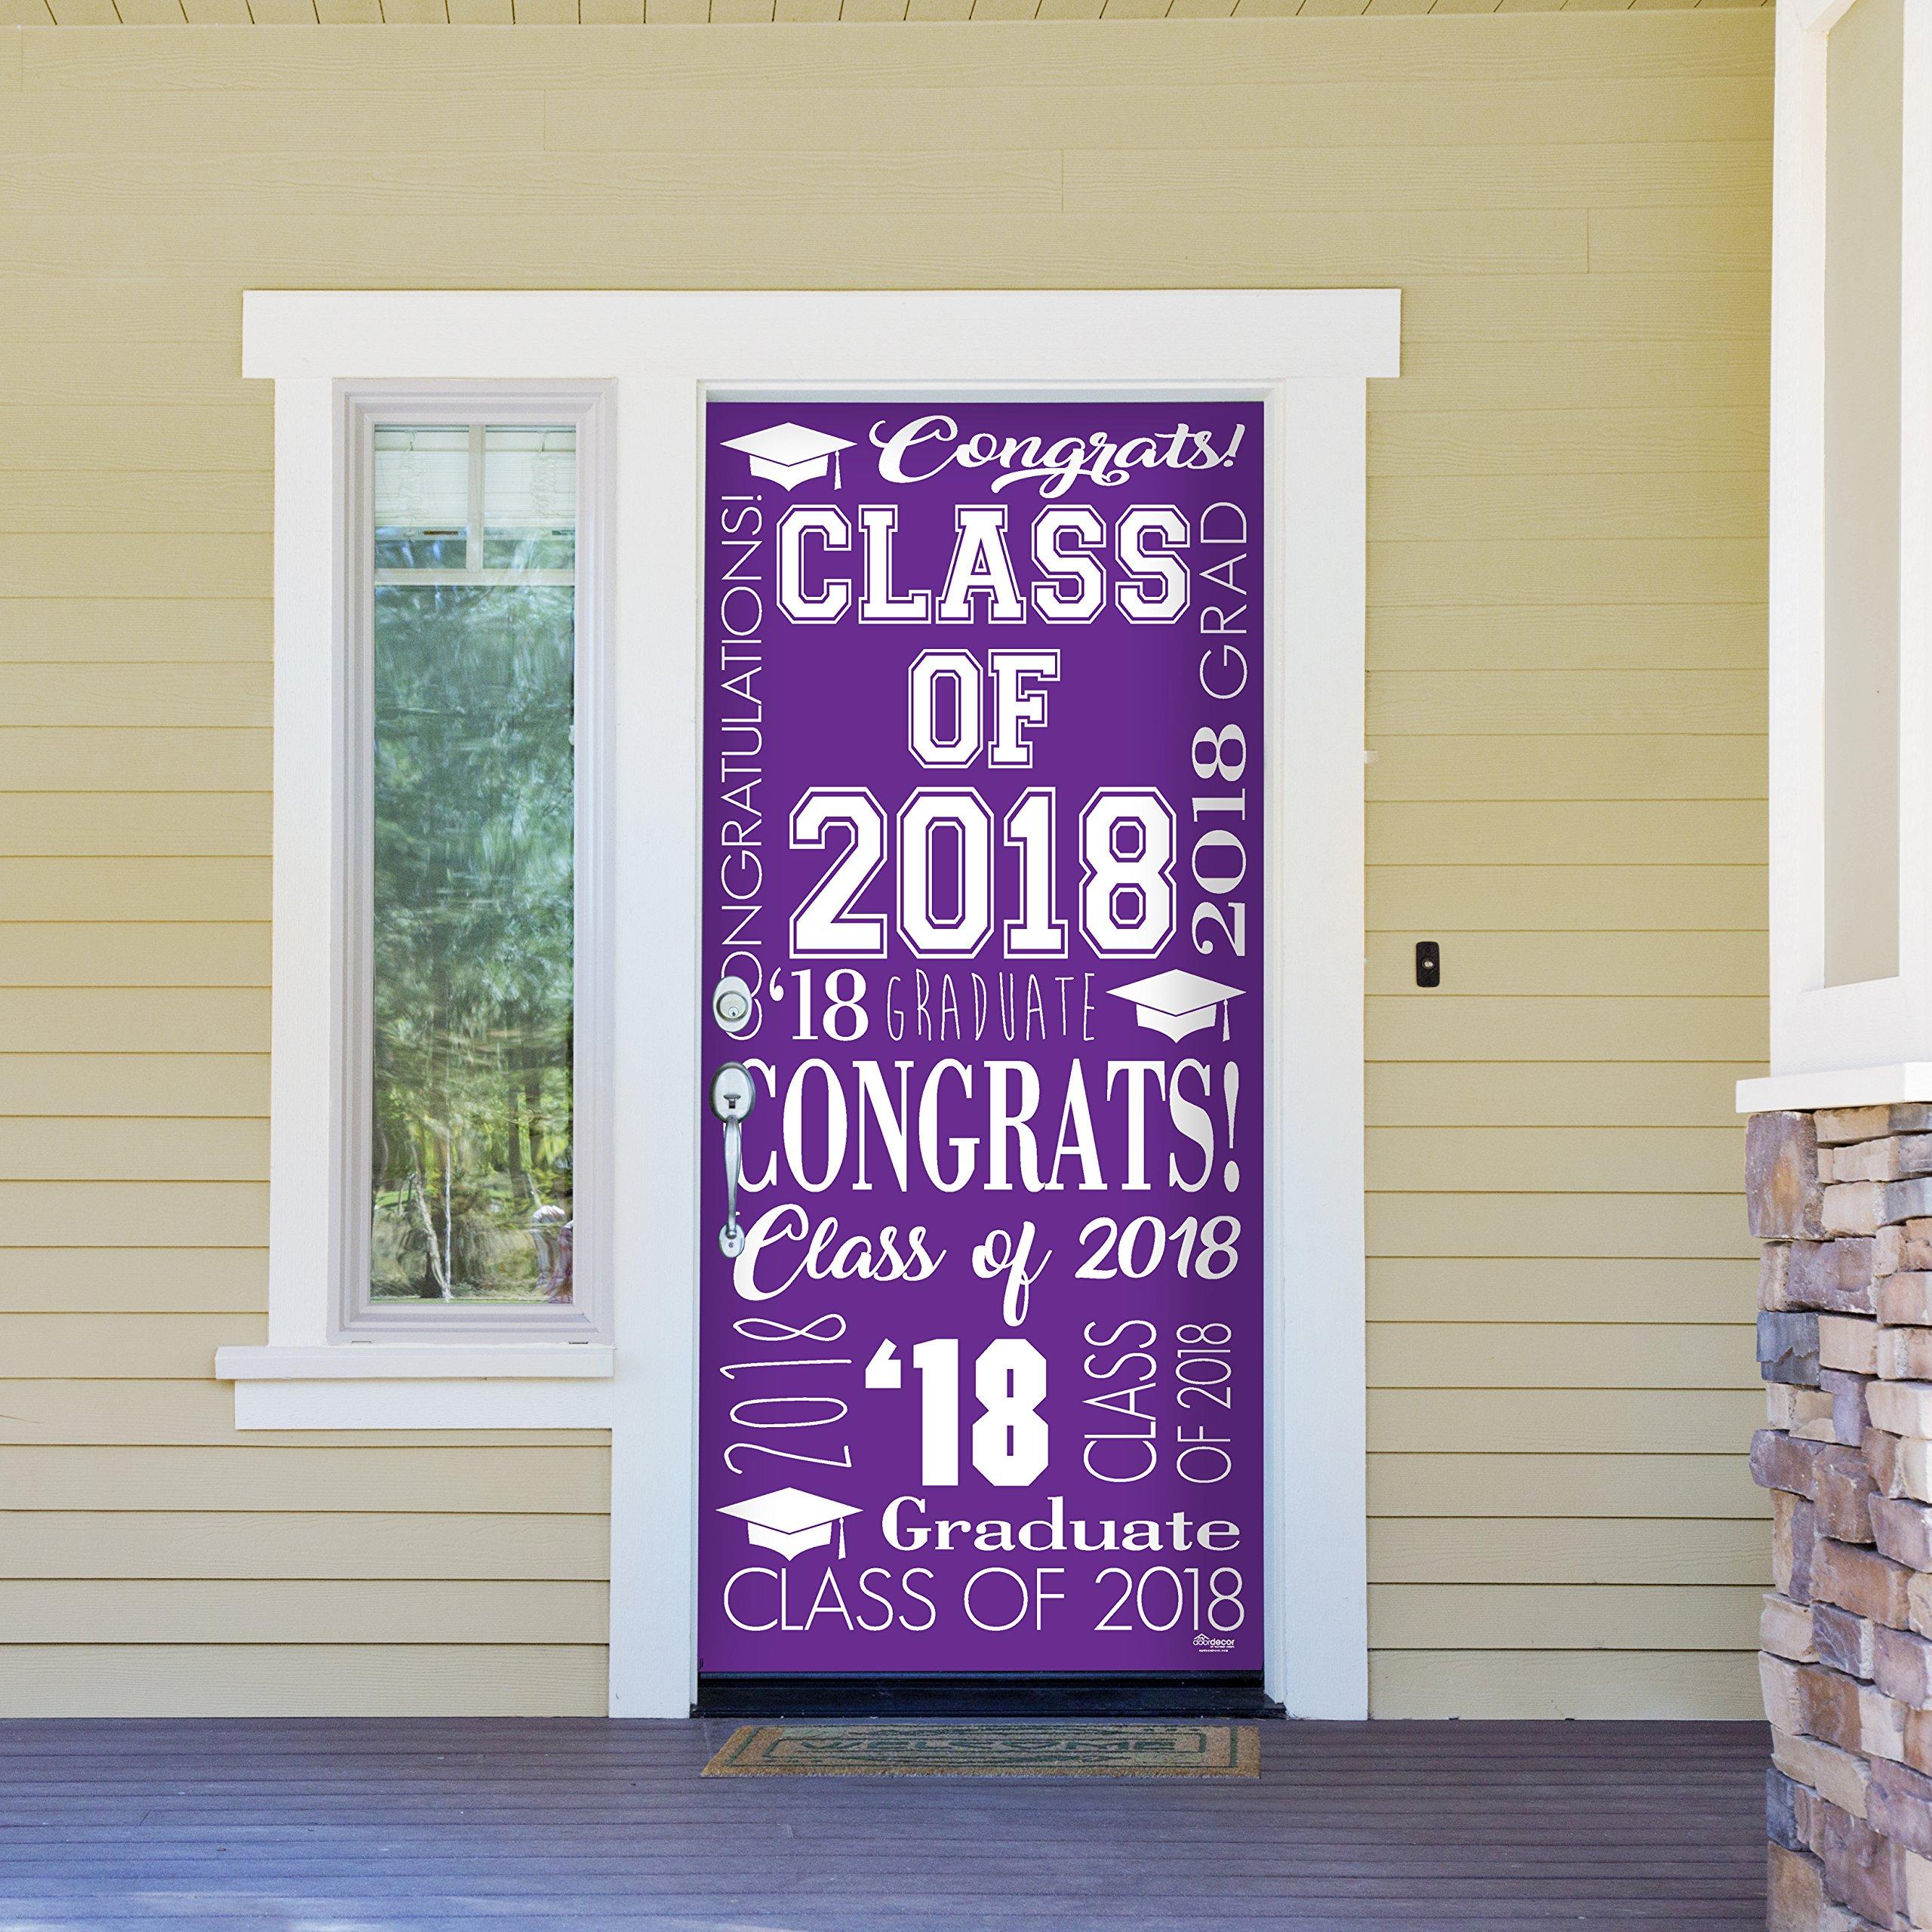 Victory Corps Collage Purple - Outdoor GRADUATION Garage Door Banner Mural Sign Décor 36'' x 80'' One Size Fits All Front Door Car Garage -The Original Holiday Front Door Banner Decor